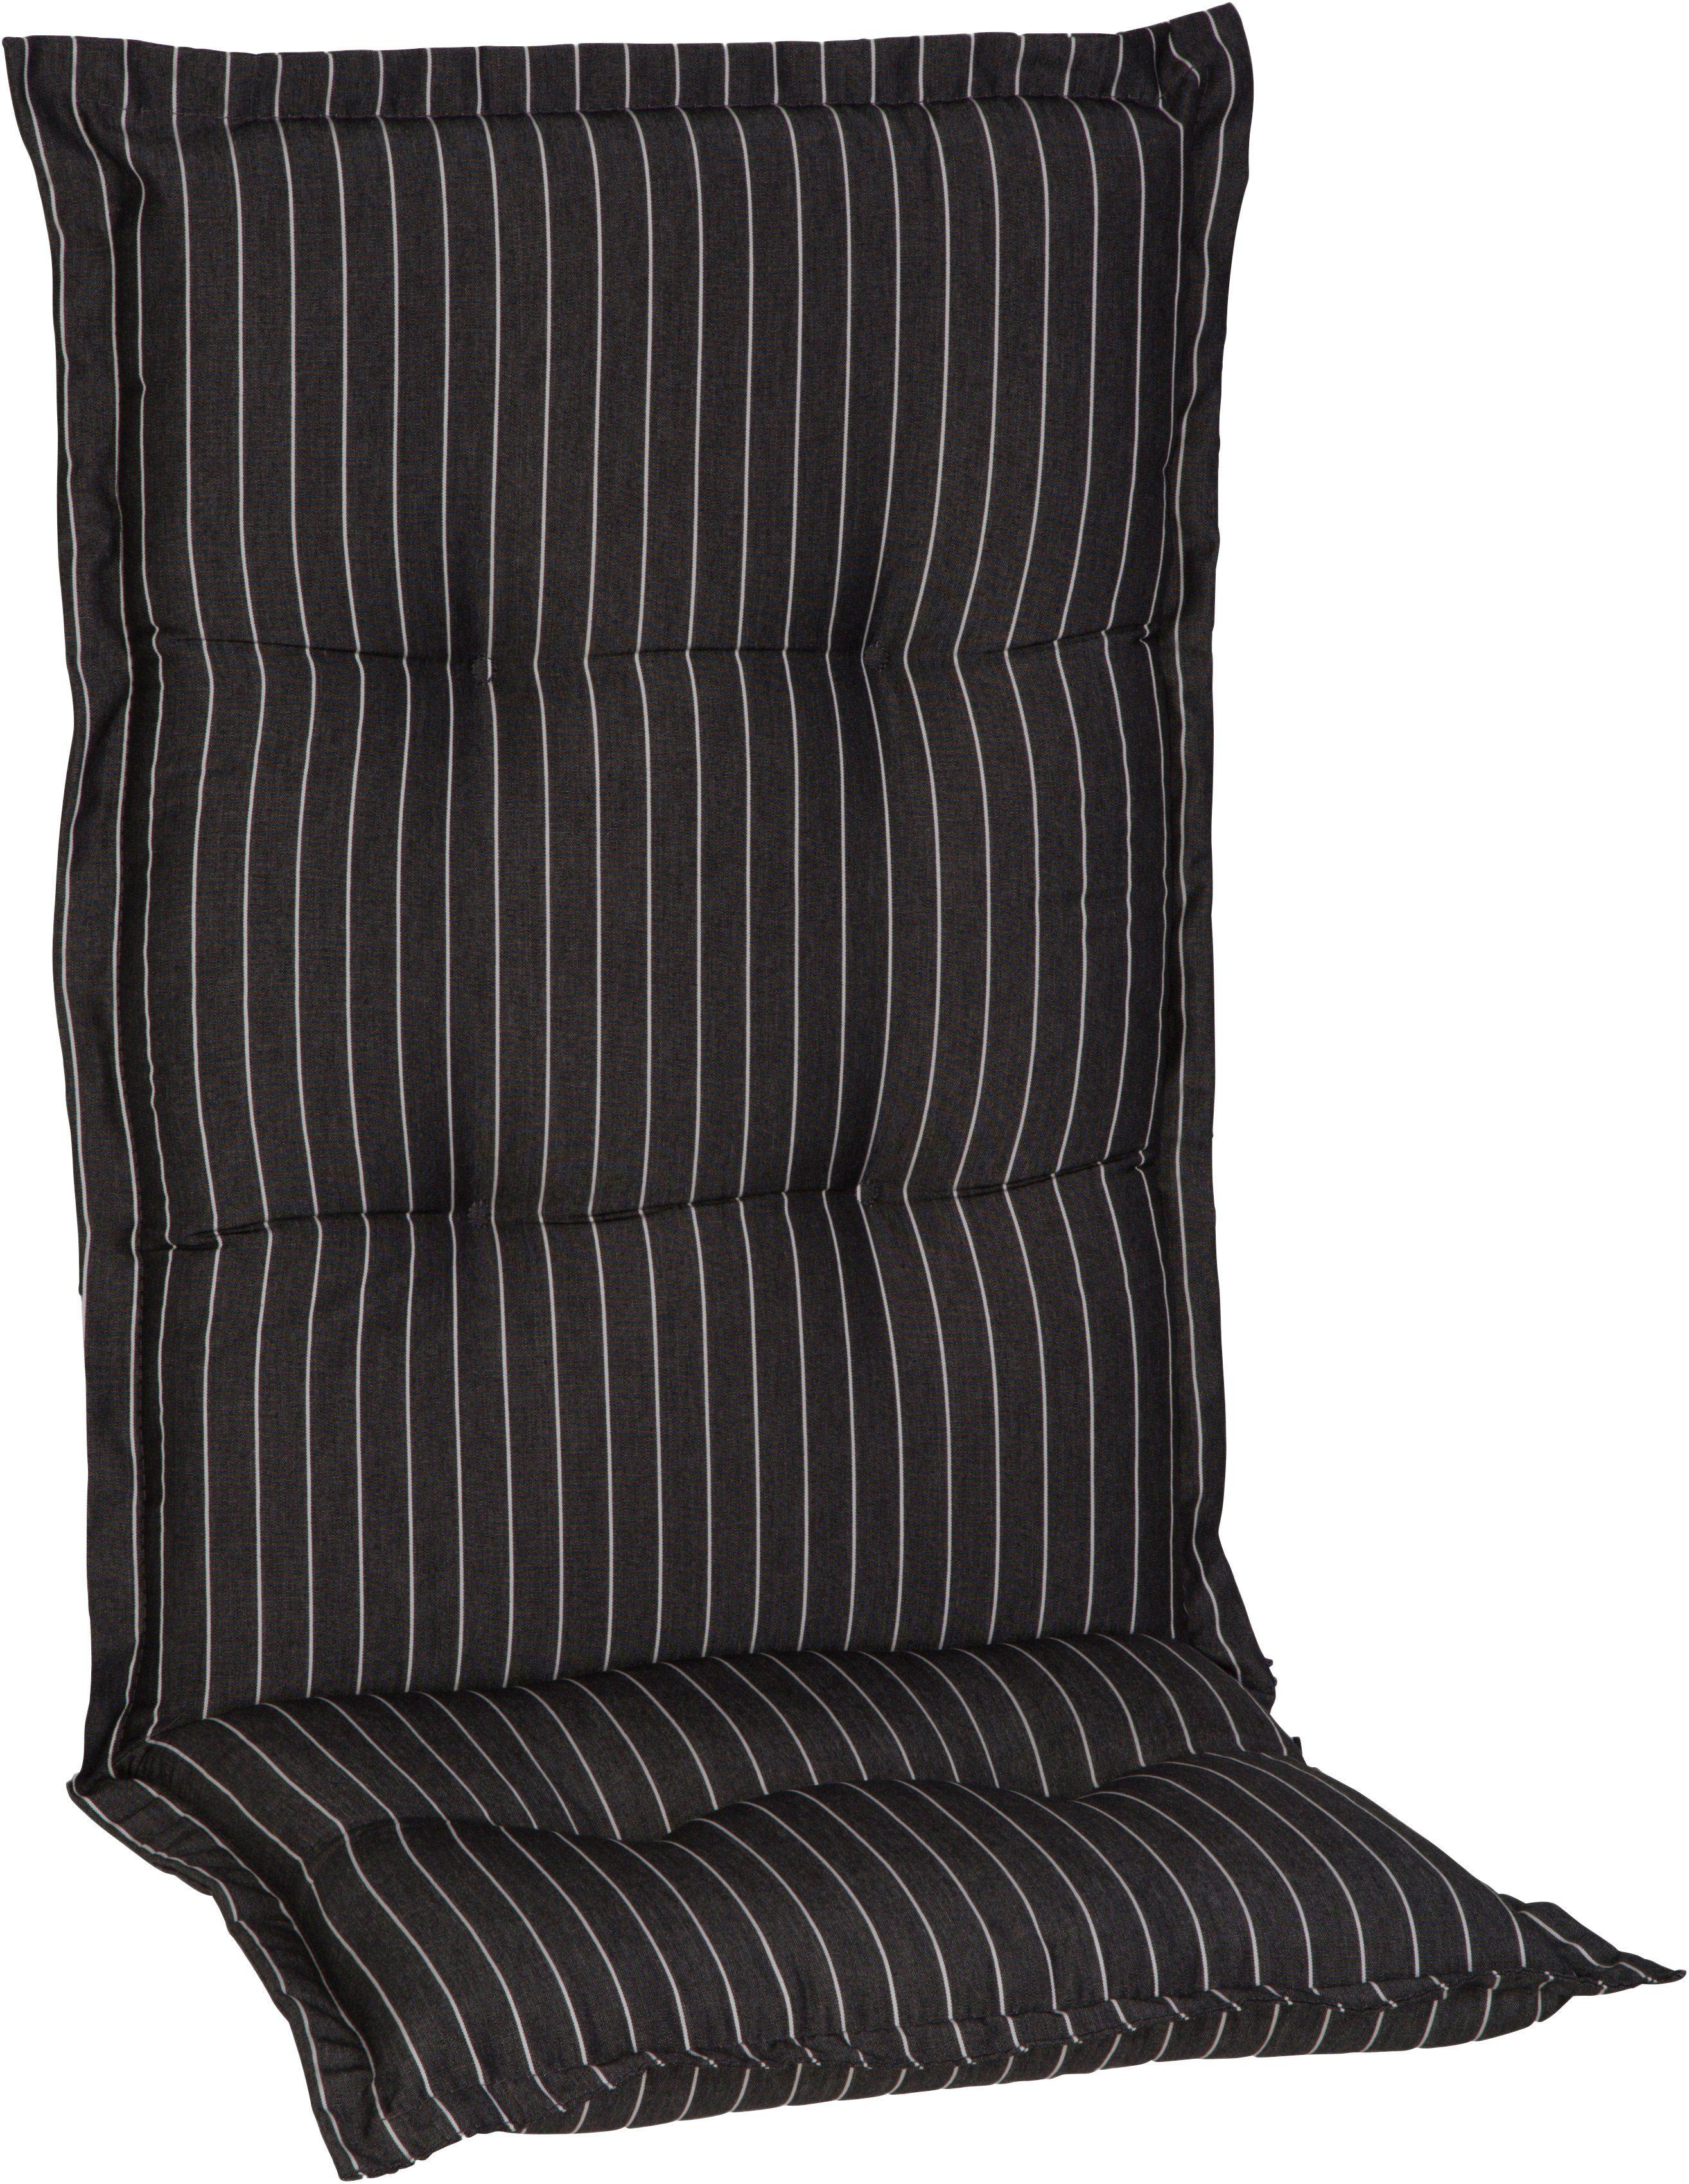 Hochlehnerauflage »Nizza«, (L/B): ca. 120x52 cm